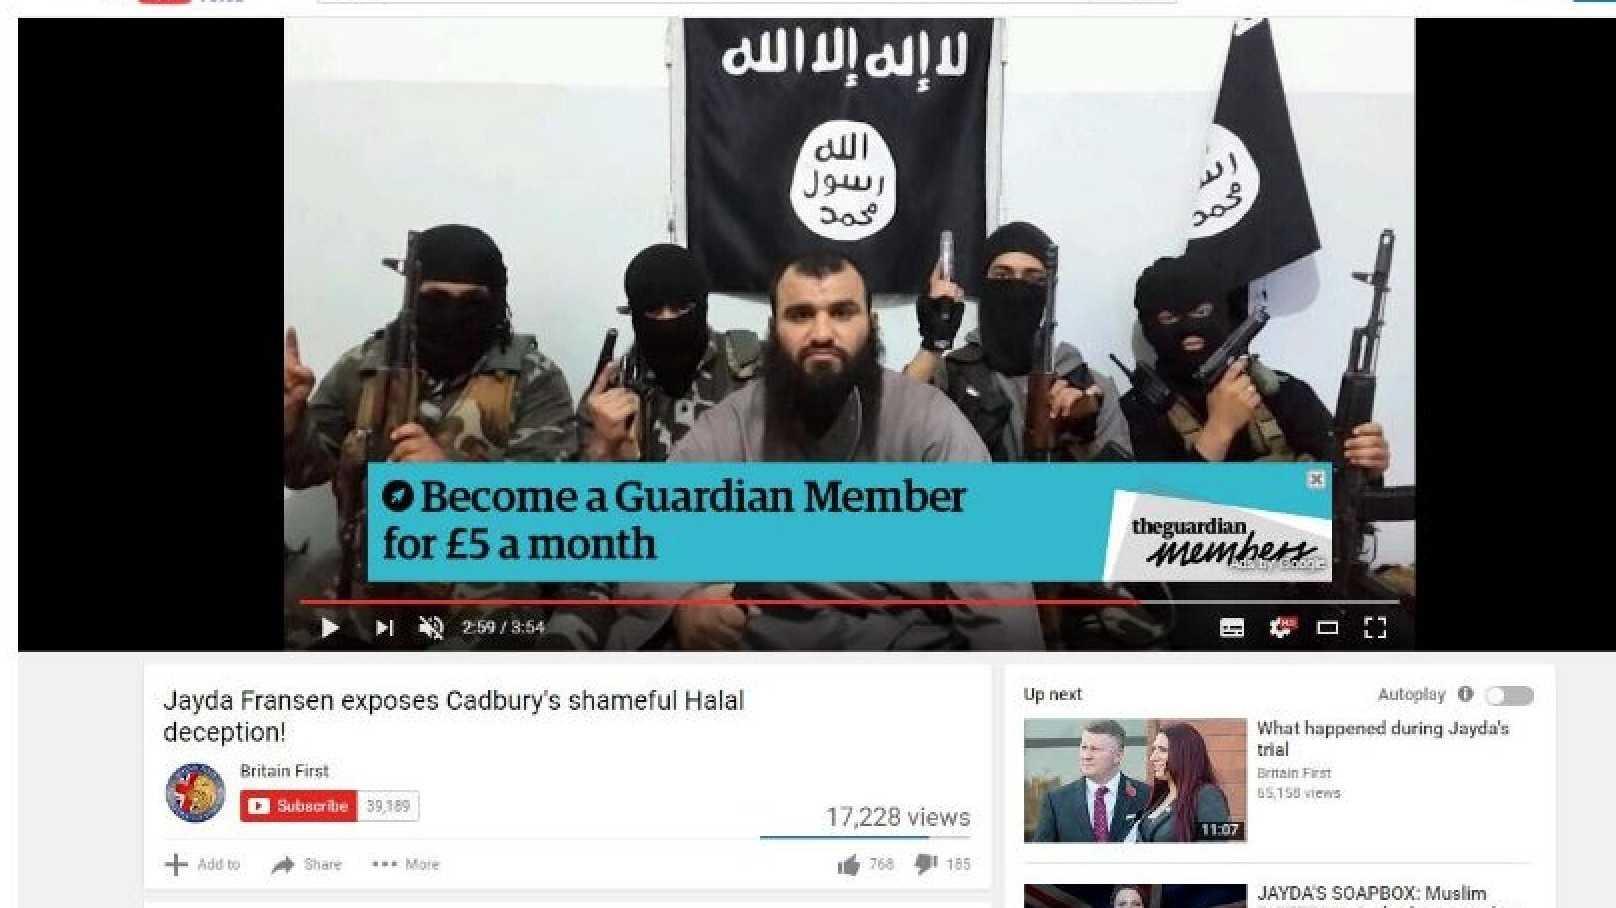 Onlinewerbung: Britische Werber boykottieren Google